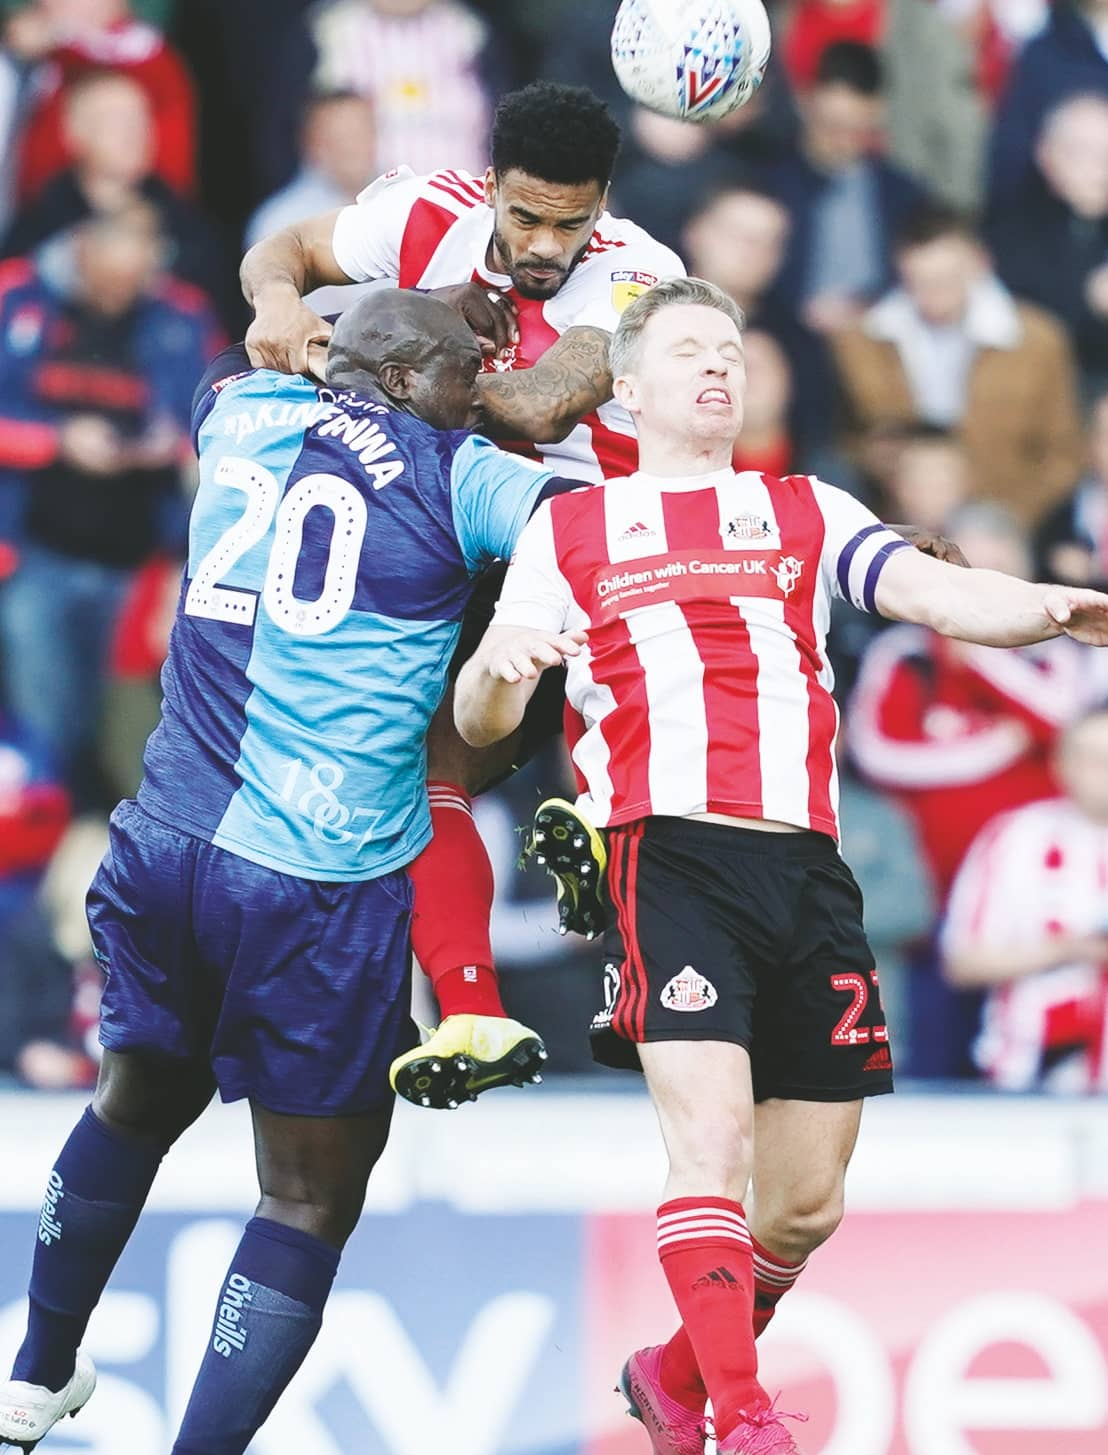 Wanderers Set Standard For Parky